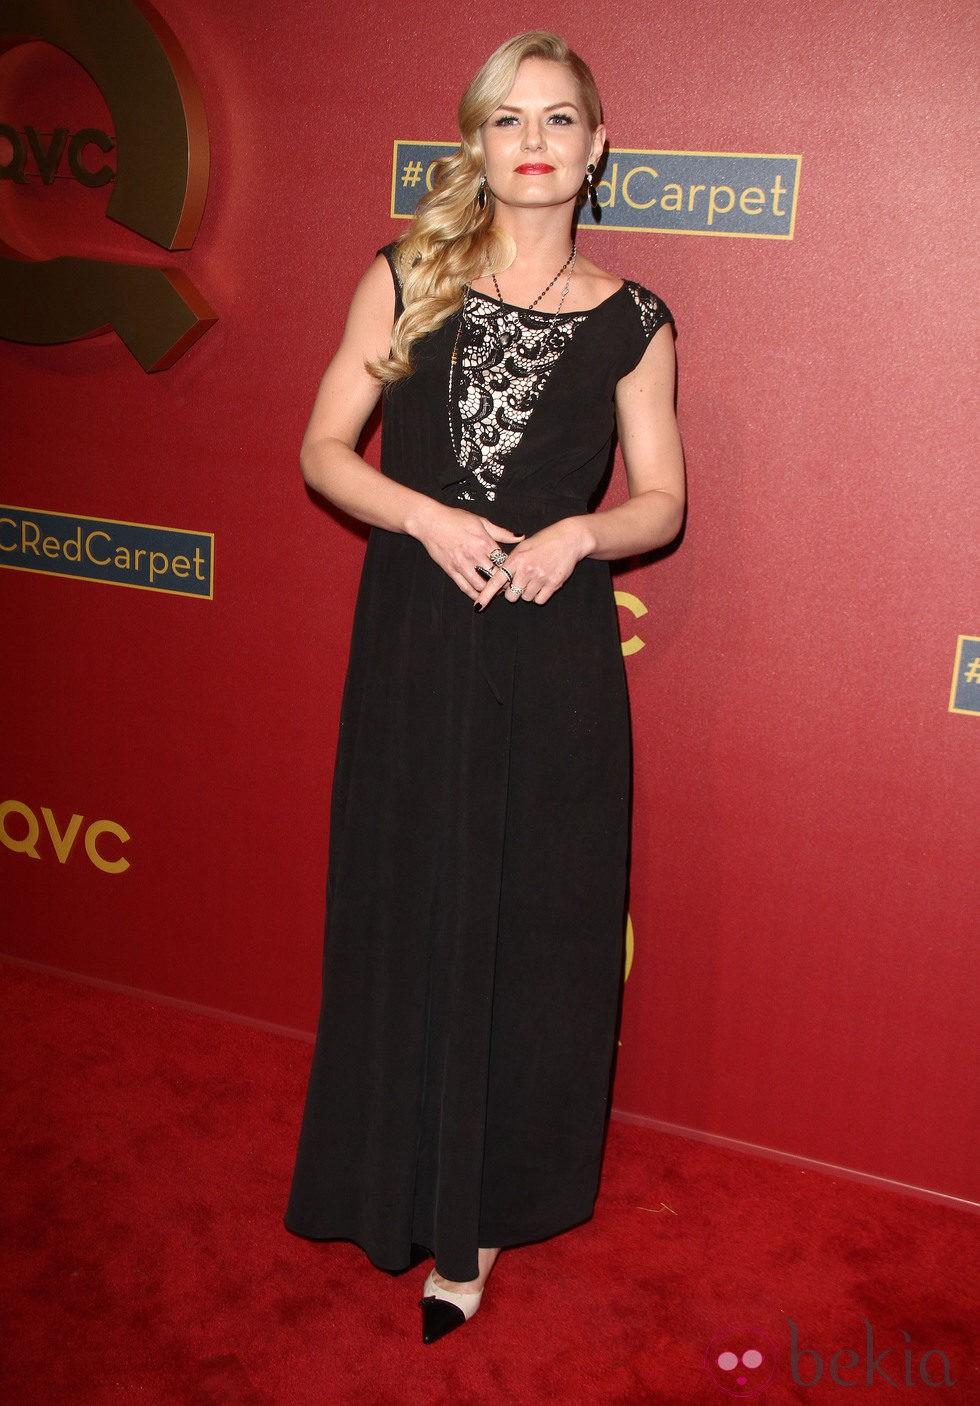 Jennifer Morrison en una fiesta previa a los Oscar 2014